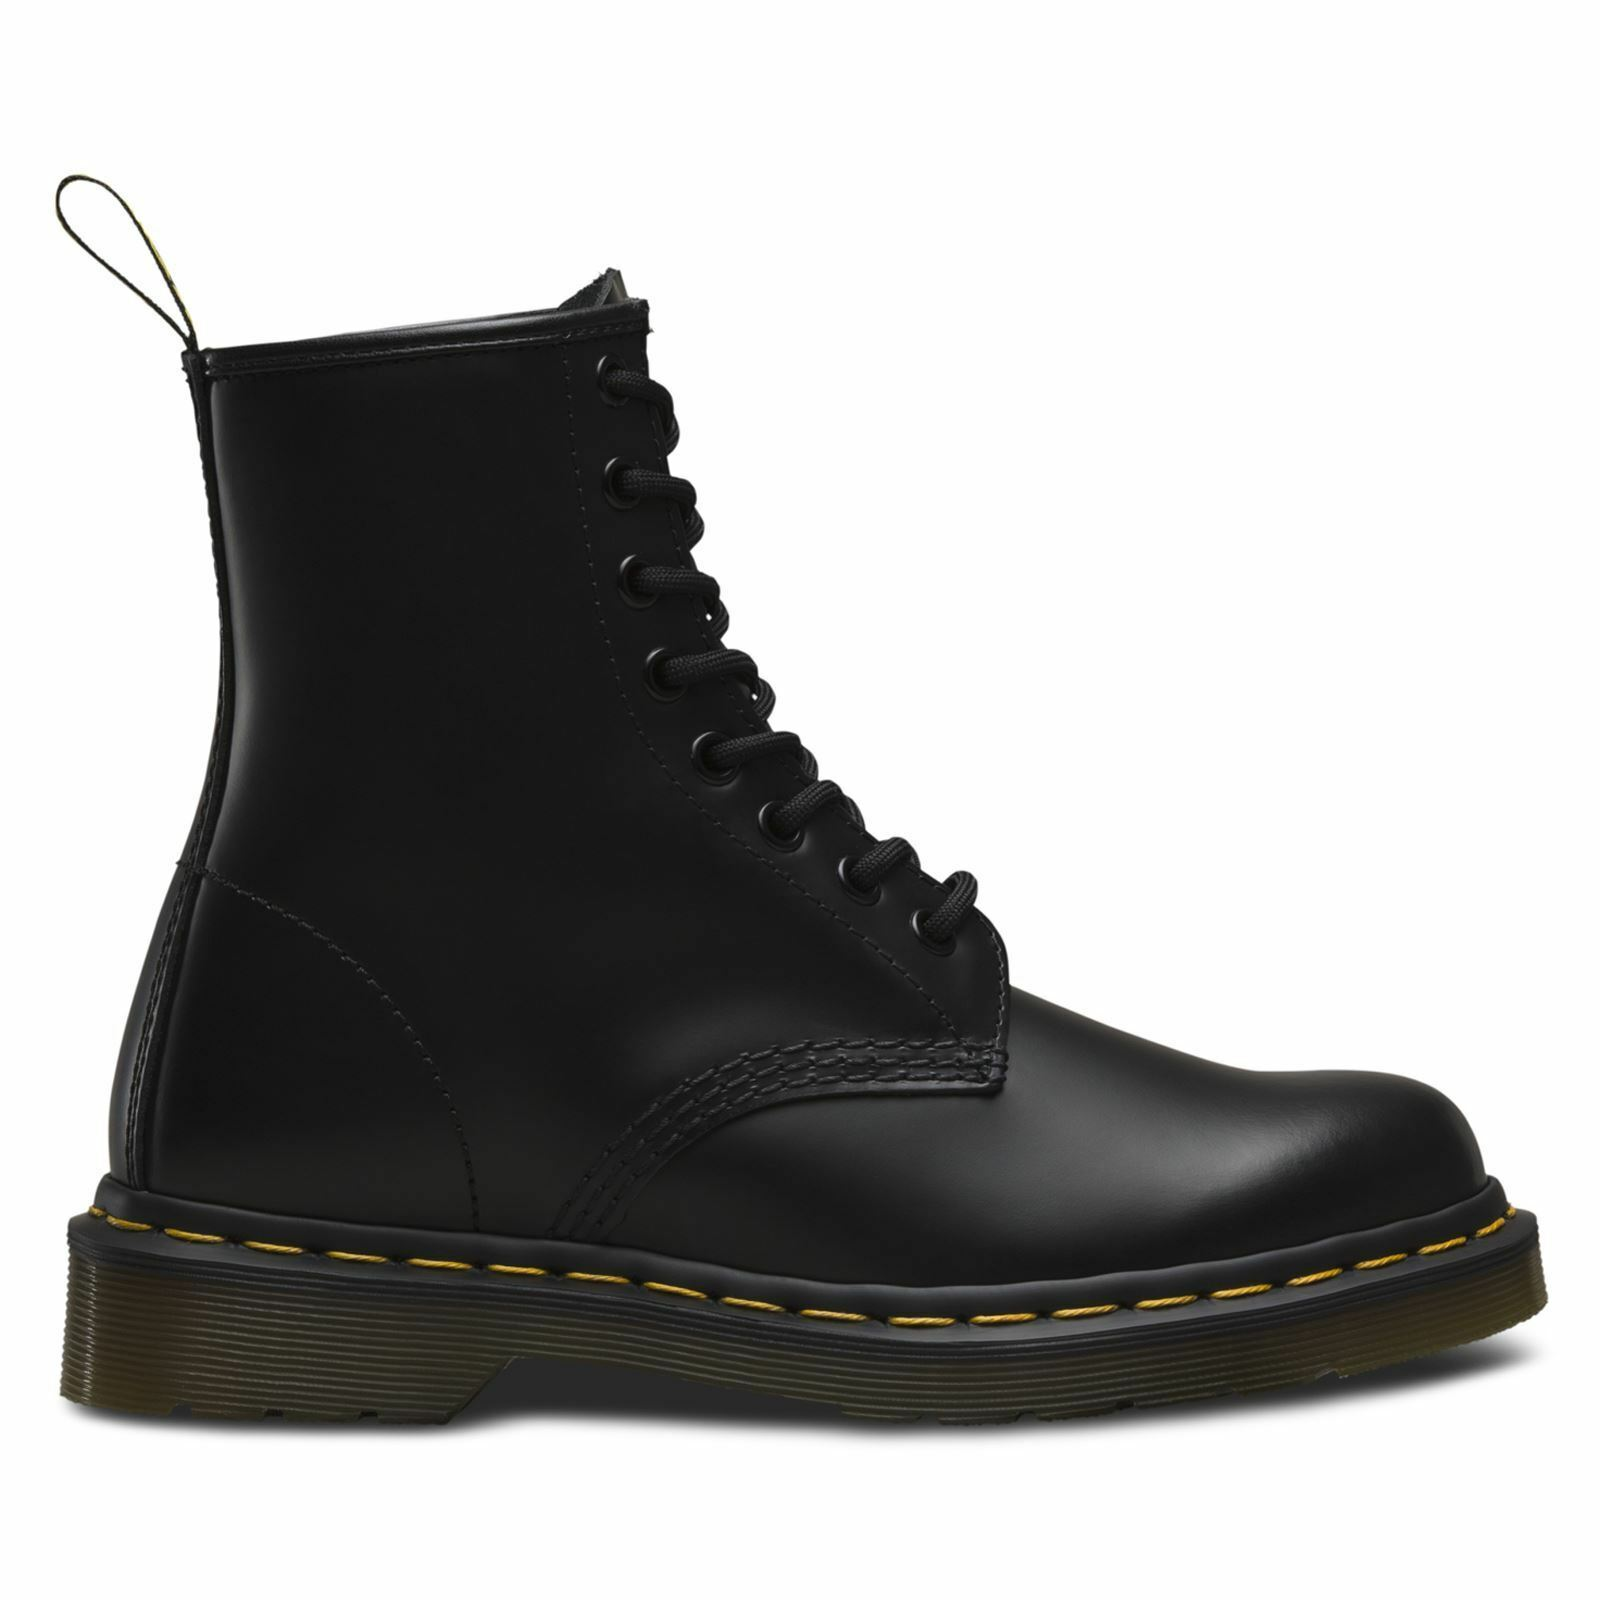 Dr.Martens 1460 8 Eyelet Black Womens - Mens Boots